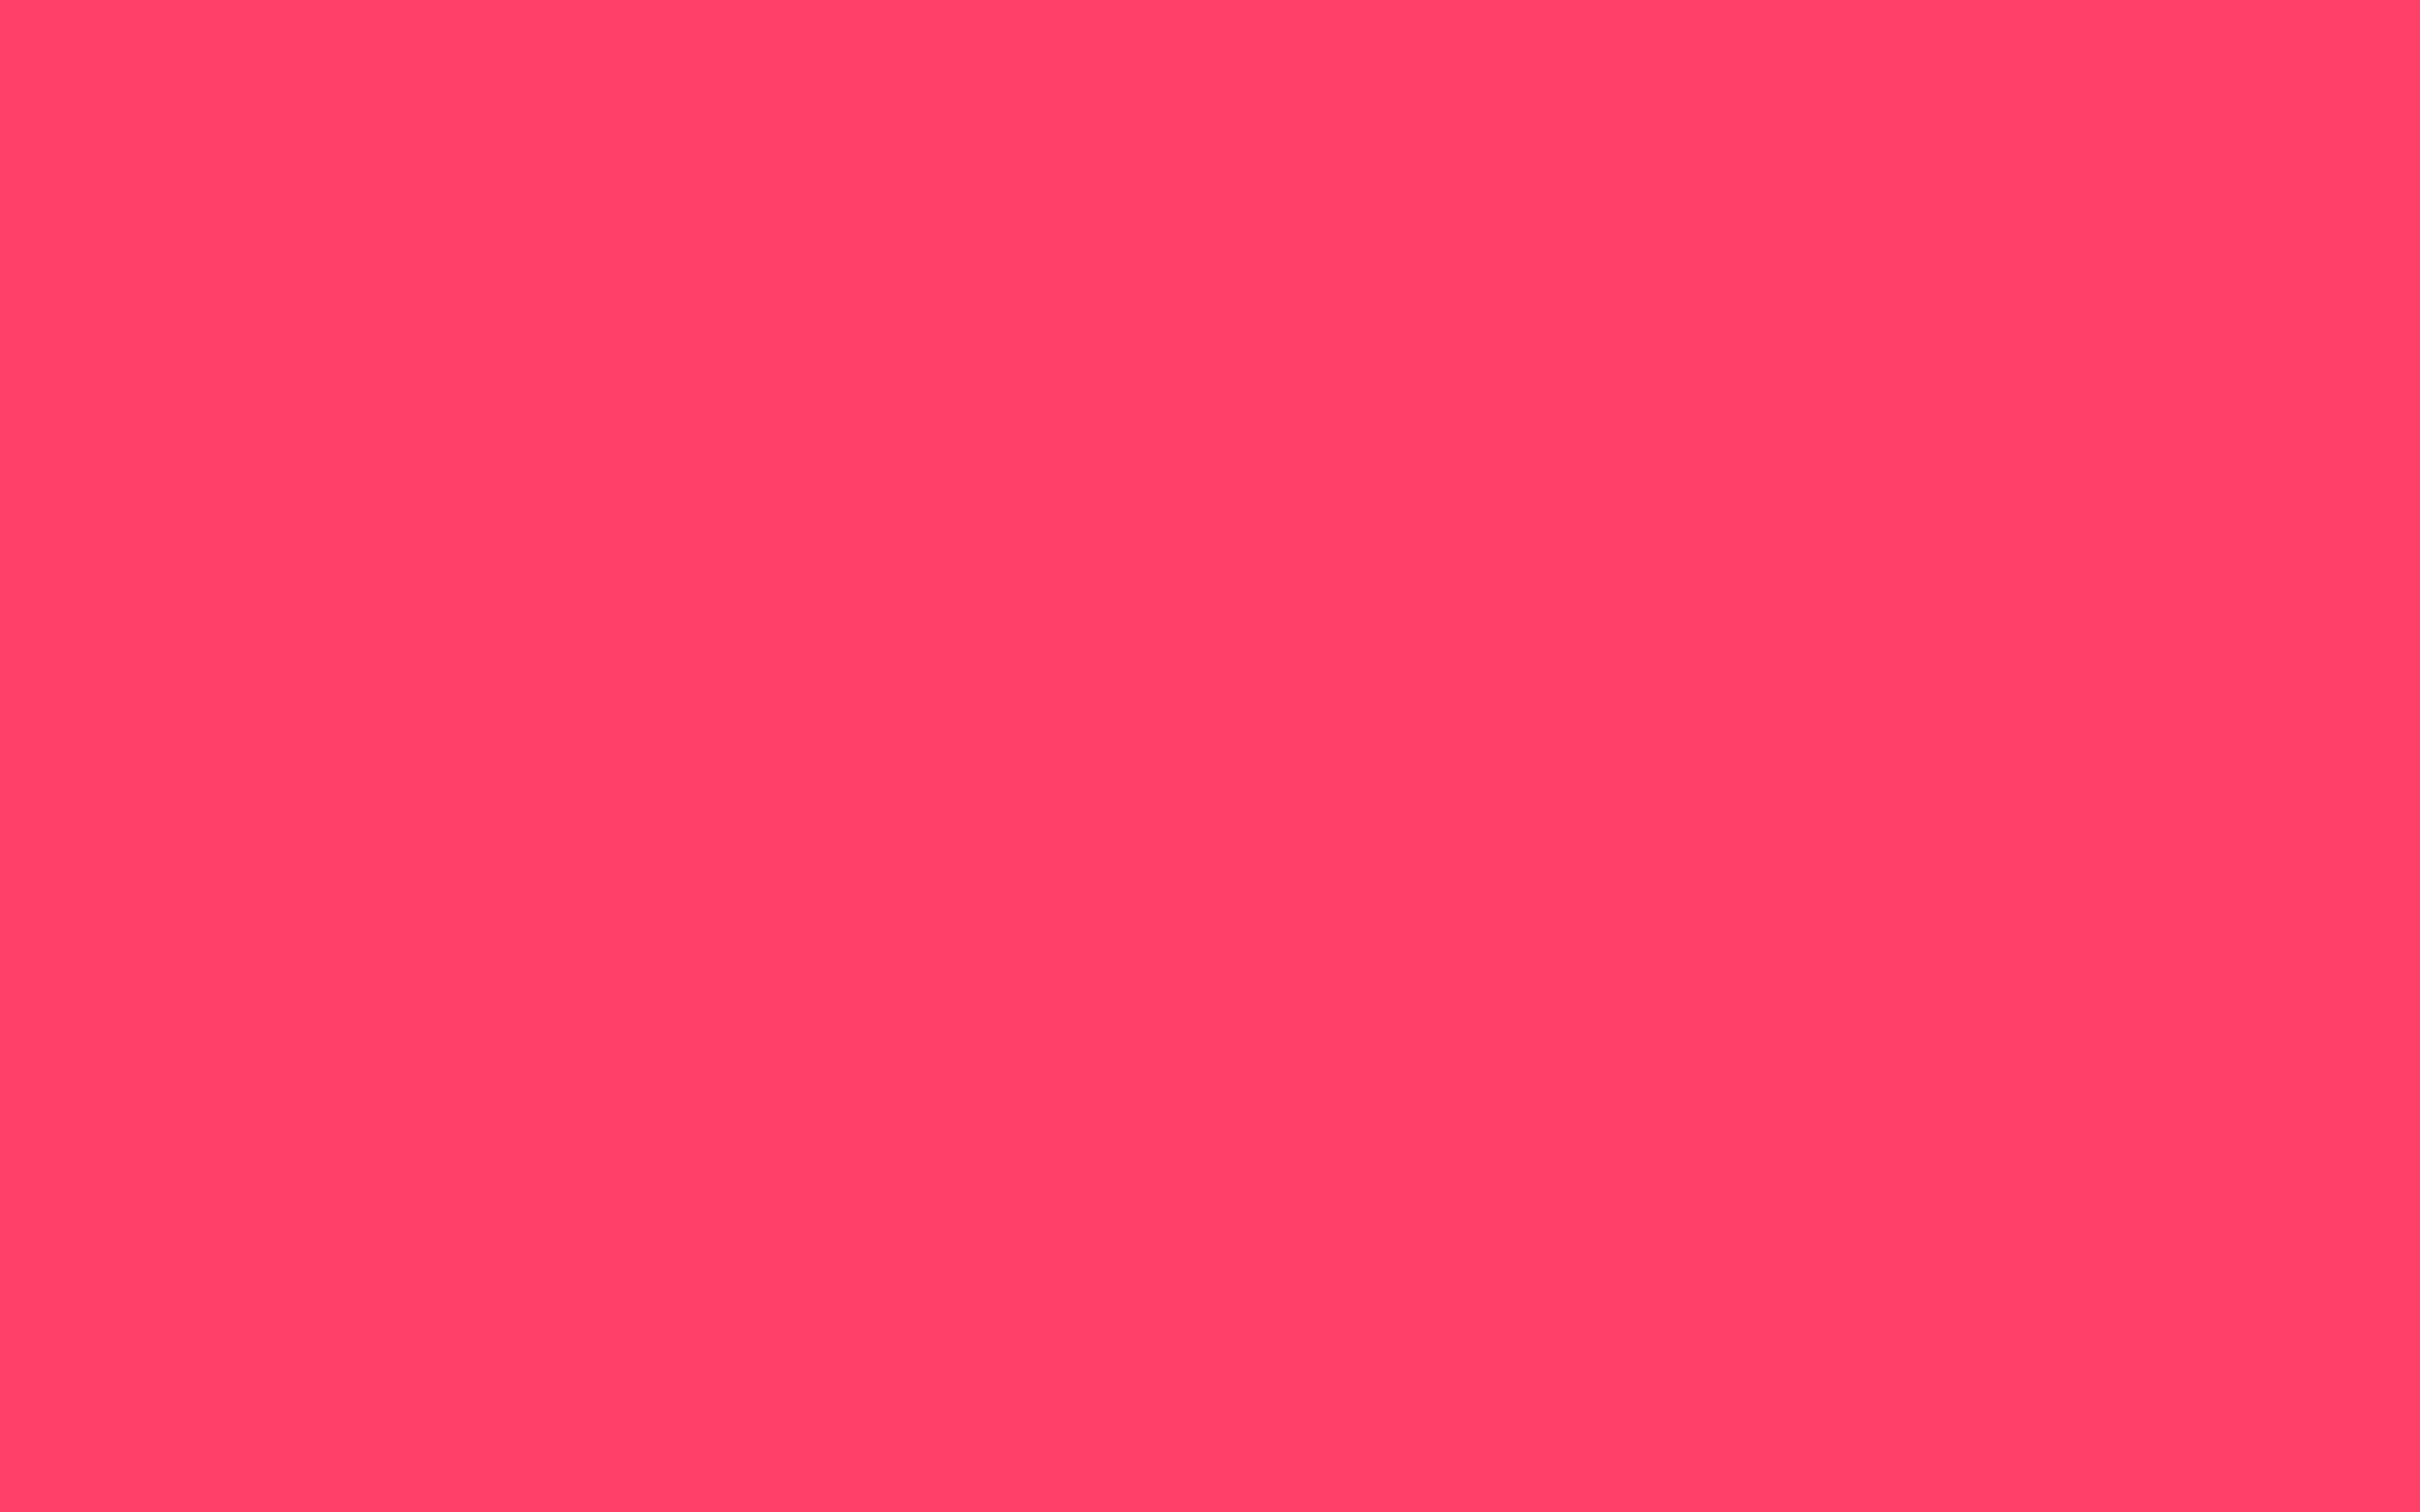 Neon Orange Backgrounds - WallpaperSafari